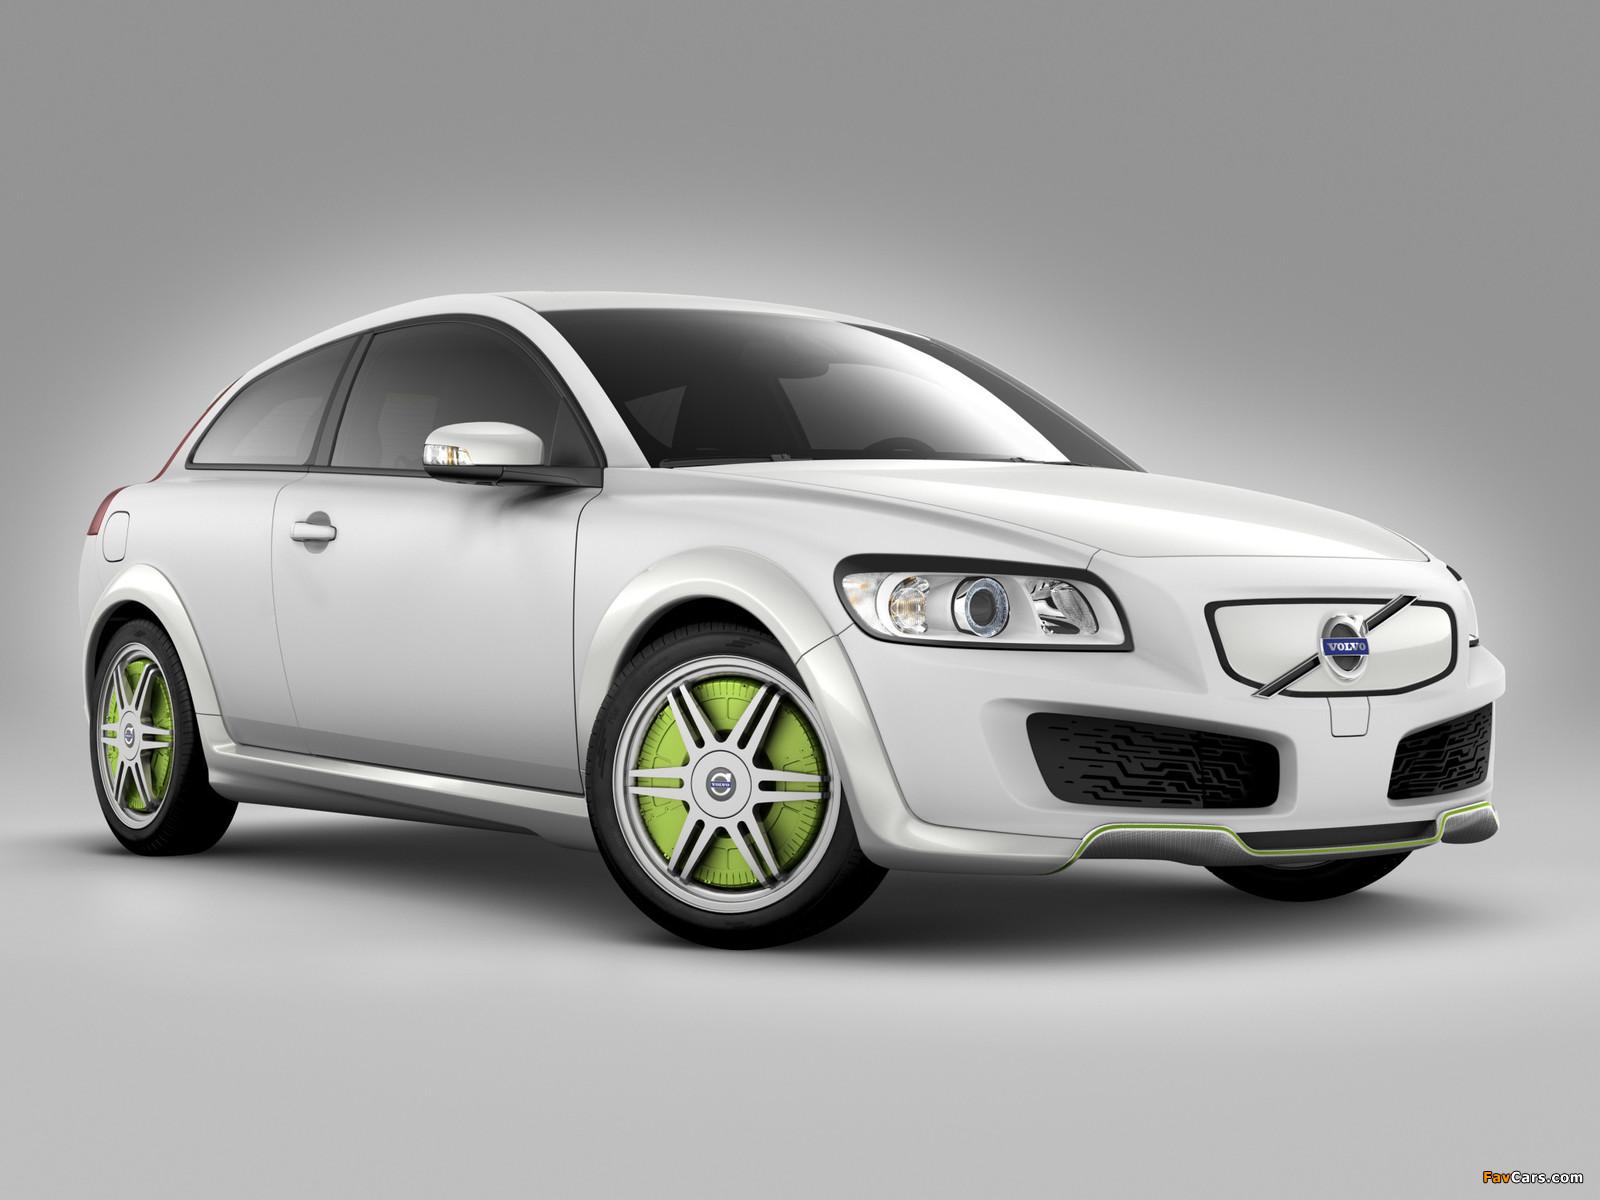 Volvo C30 ReCharge Concept 2007 images (1600 x 1200)